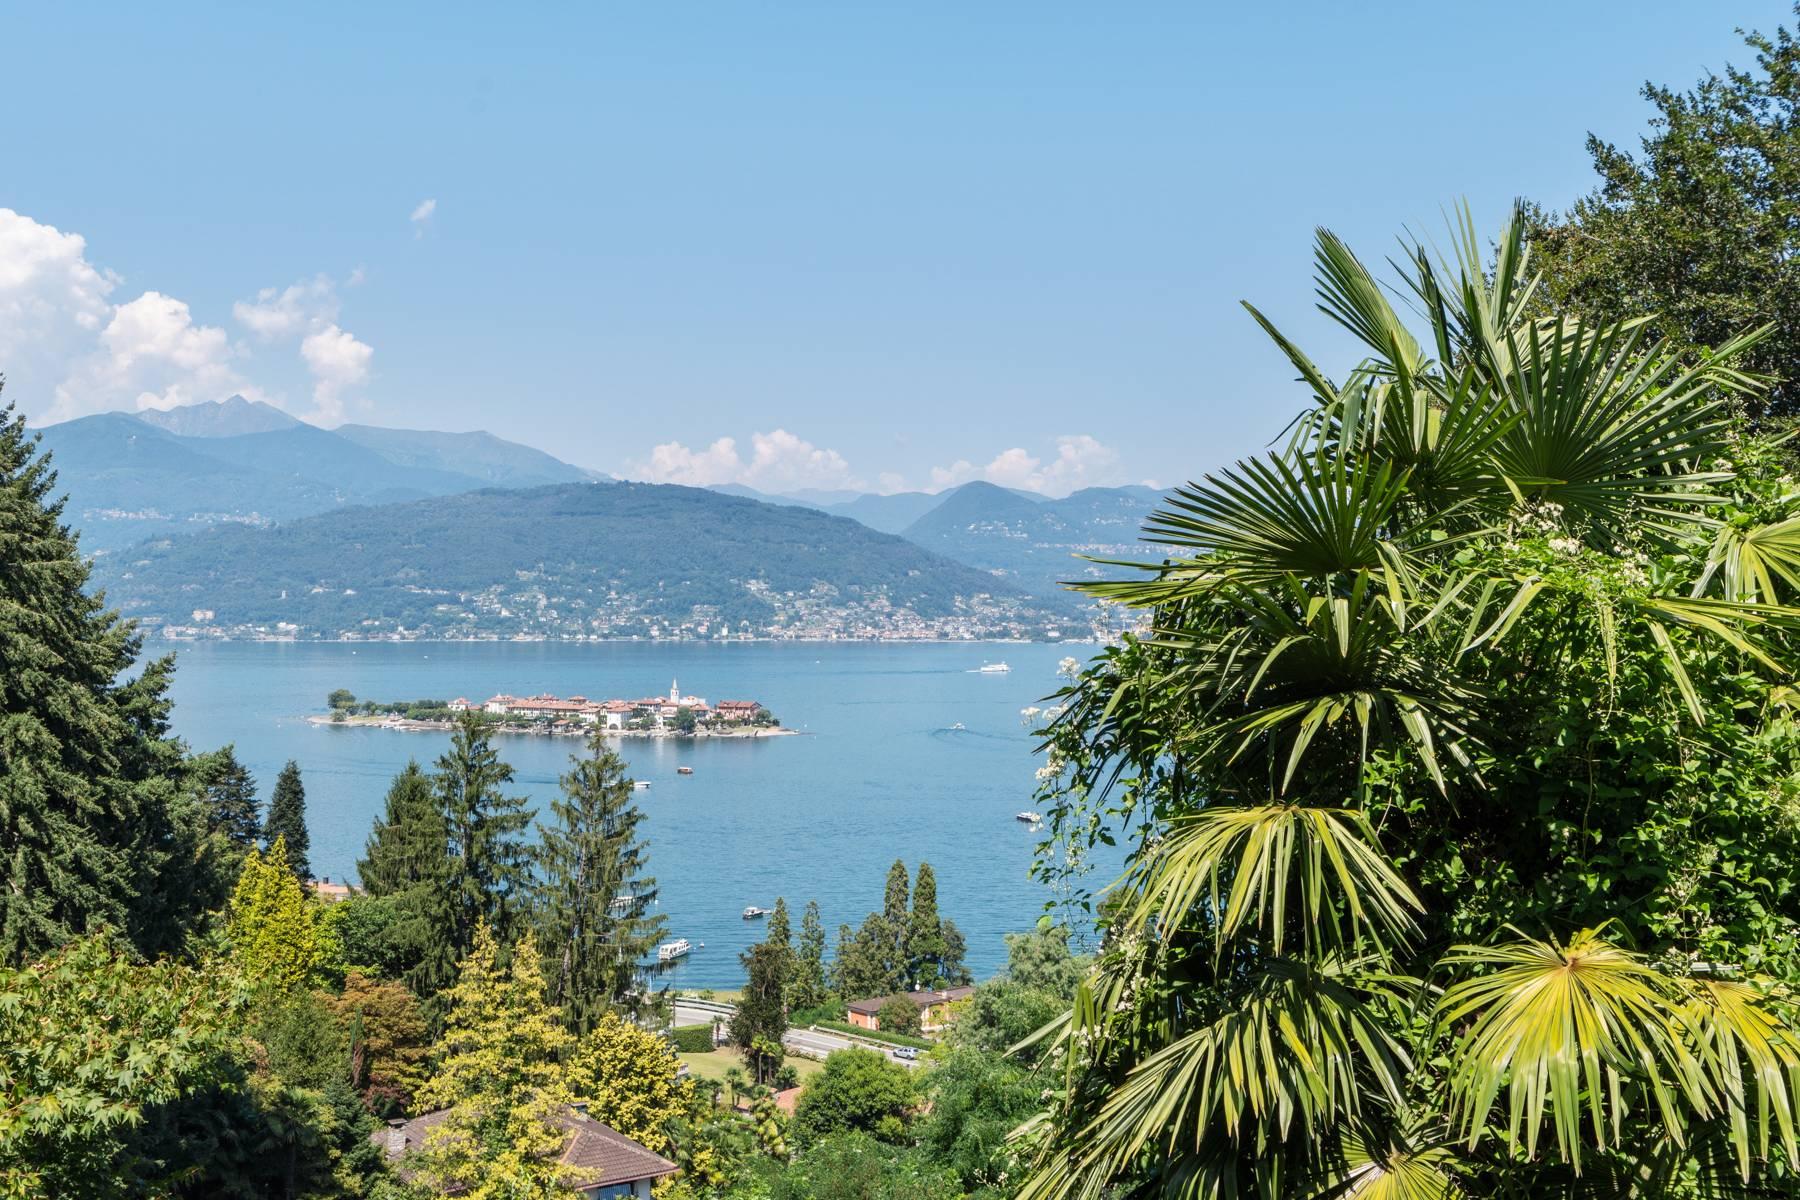 Villa in Vendita a Stresa: 5 locali, 364 mq - Foto 3